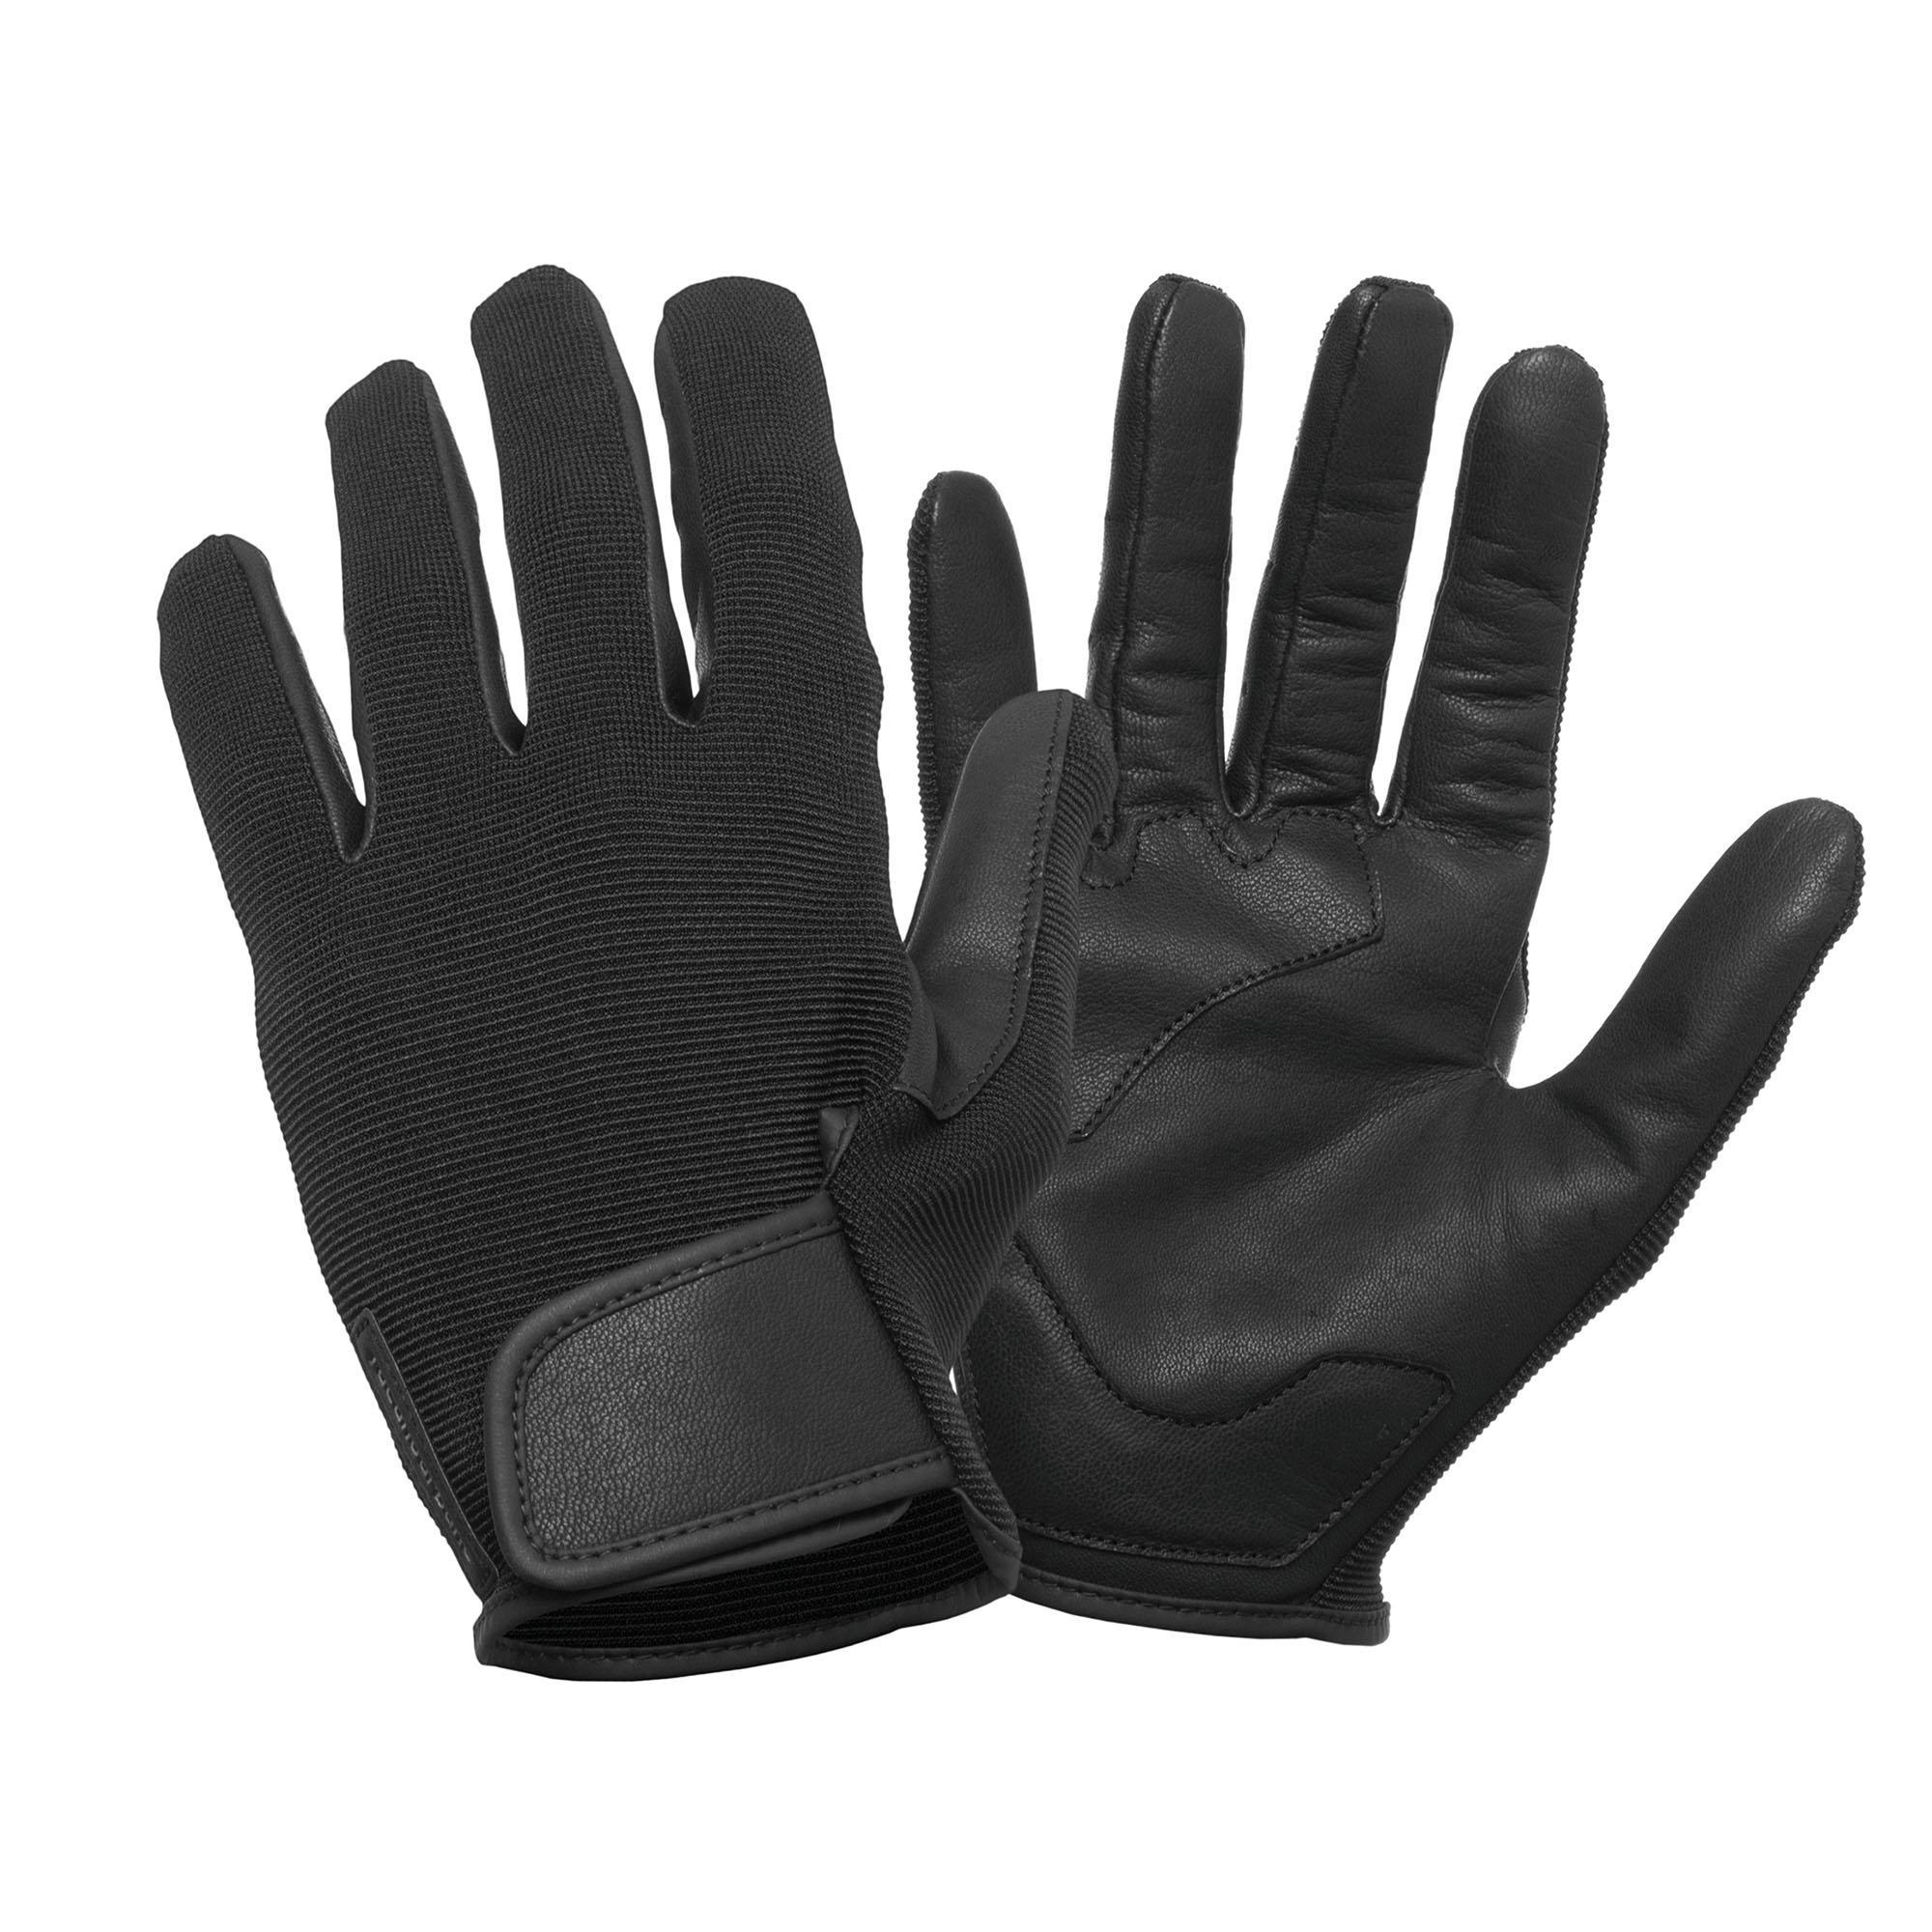 Adamo gant